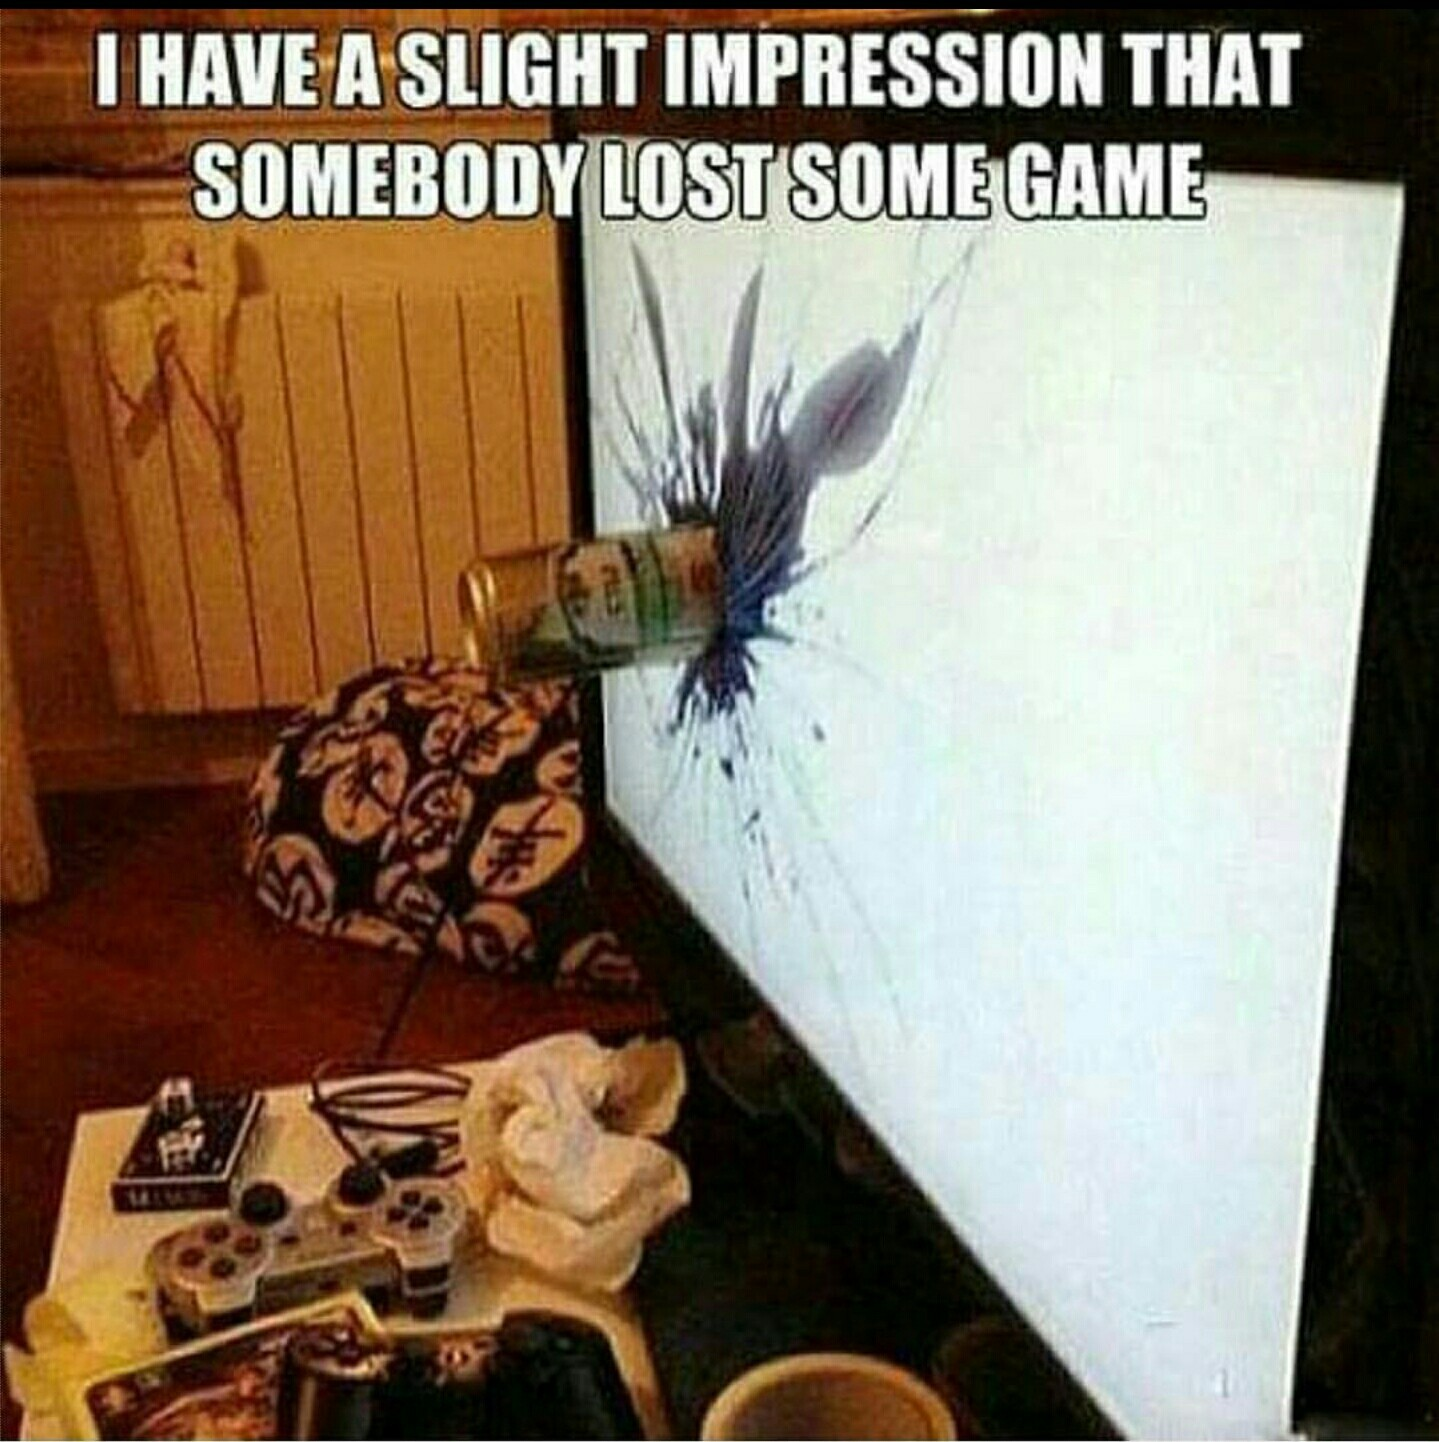 Angry gamers be like - meme